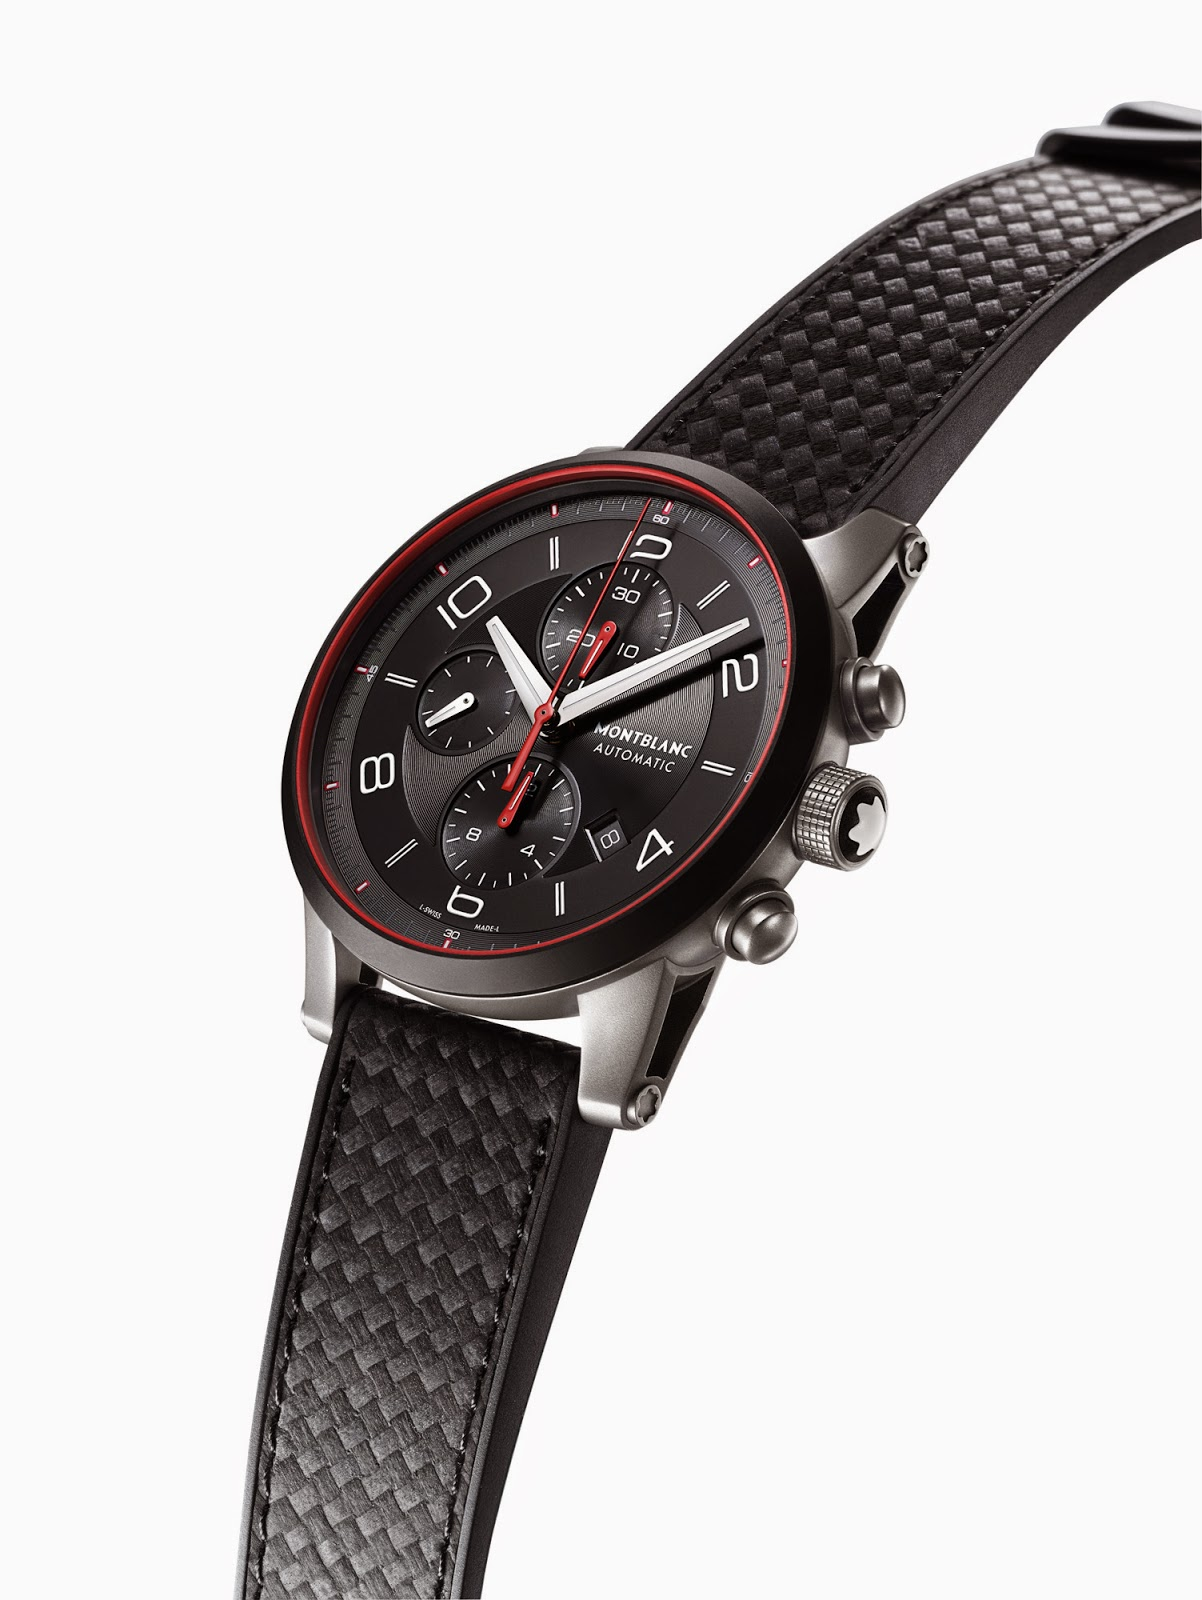 Montblanc TimeWalker Urban Speed Cronograph, debajodelreloj 1